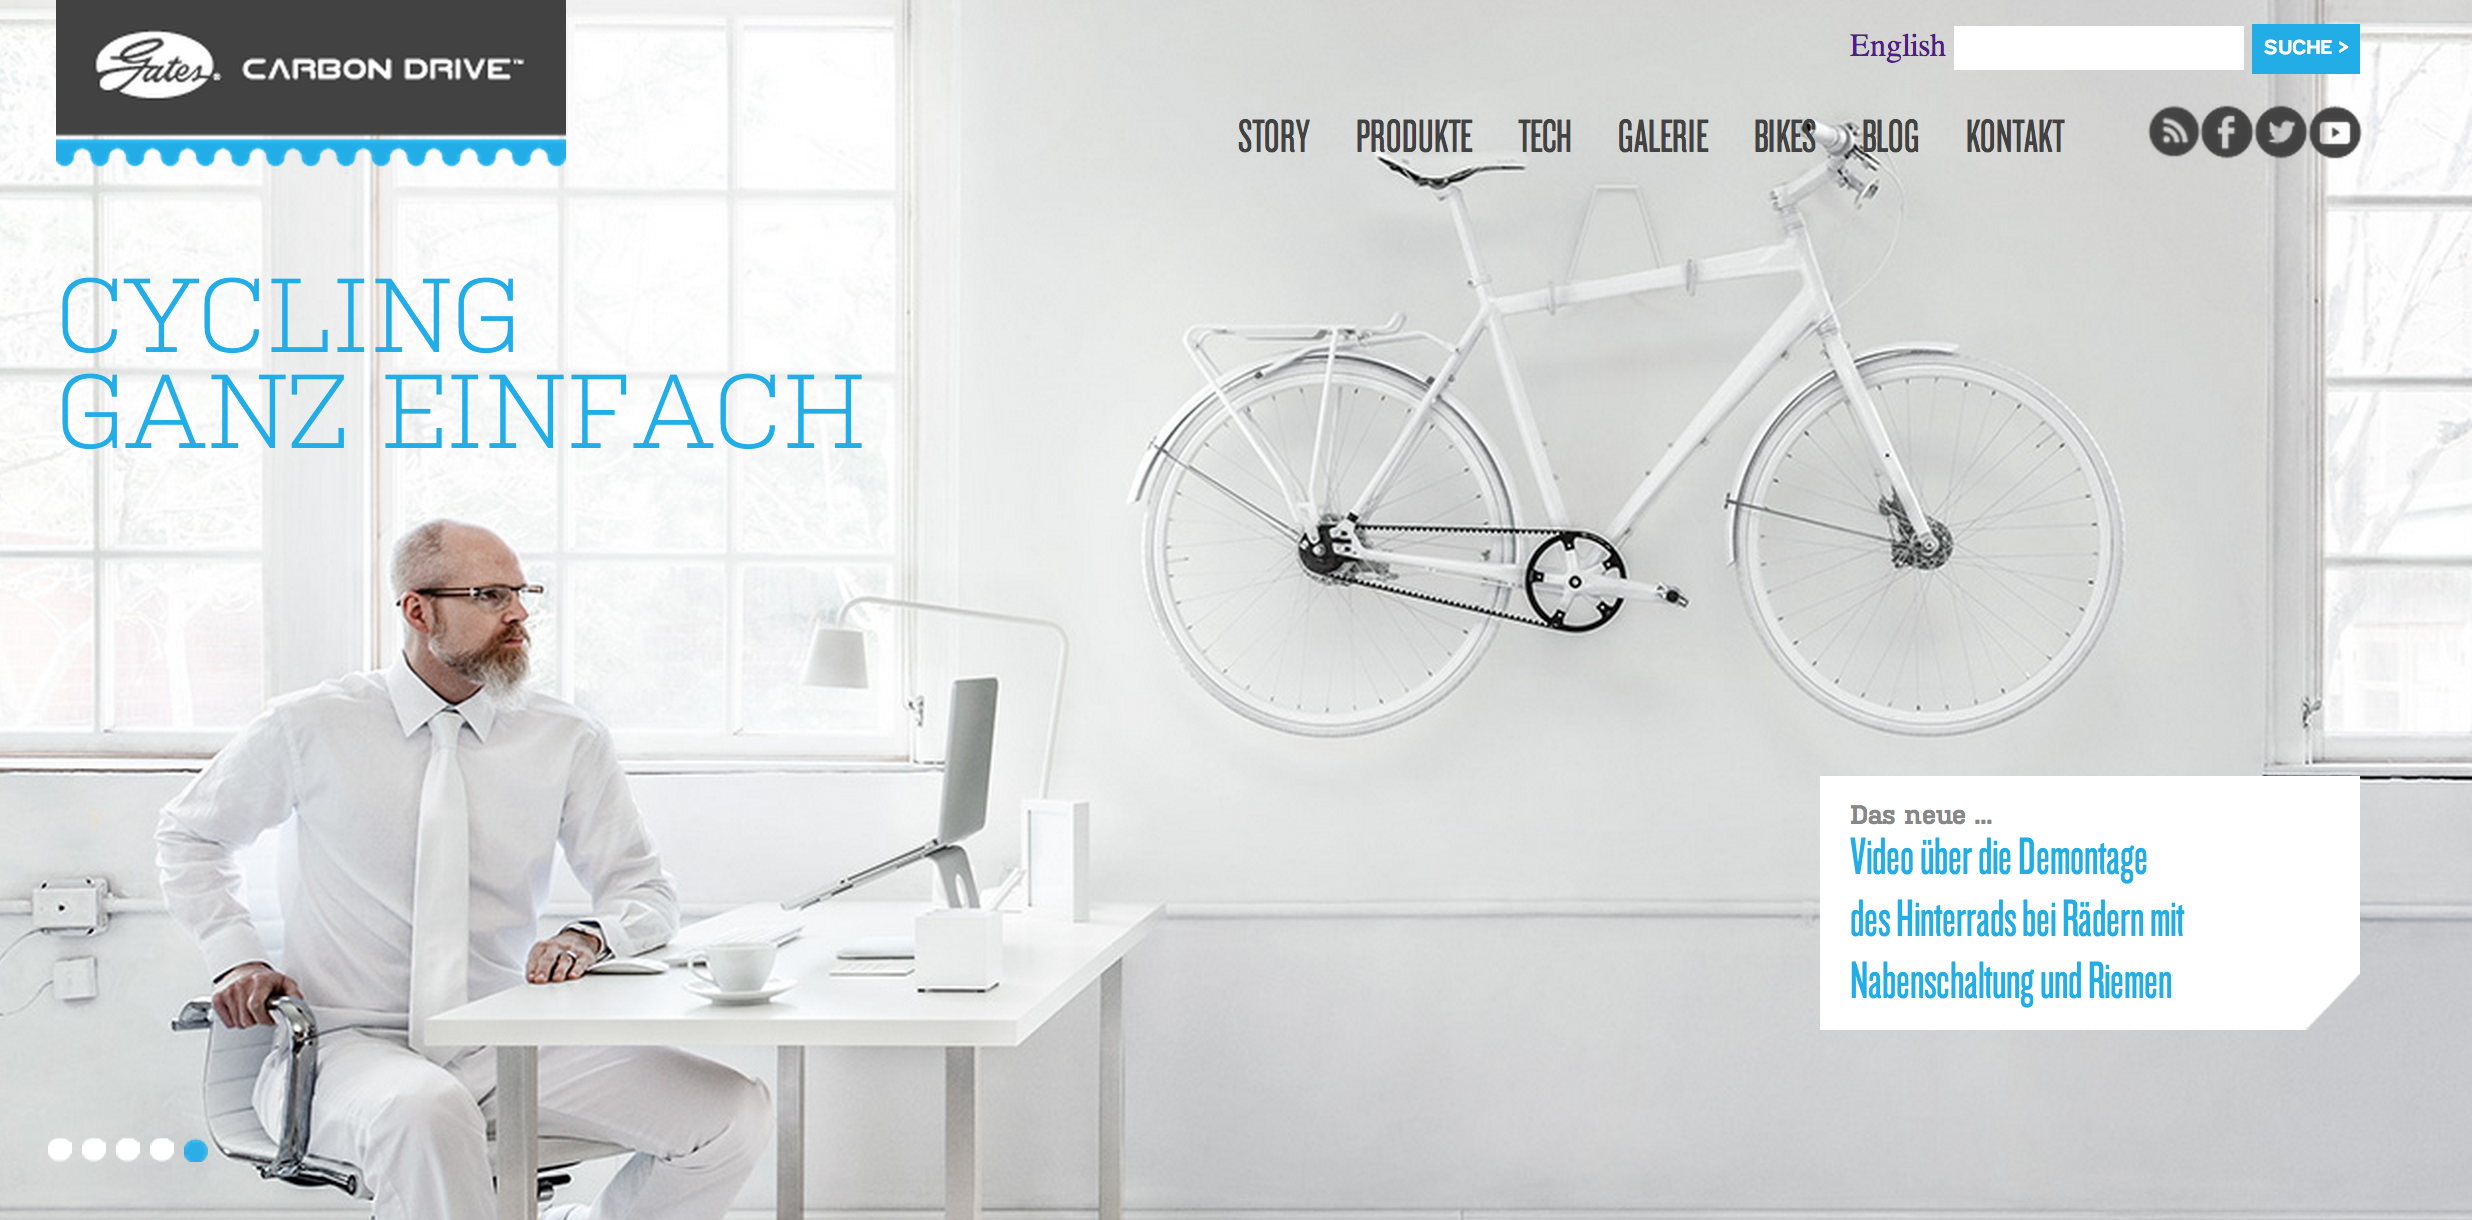 Gates German website image